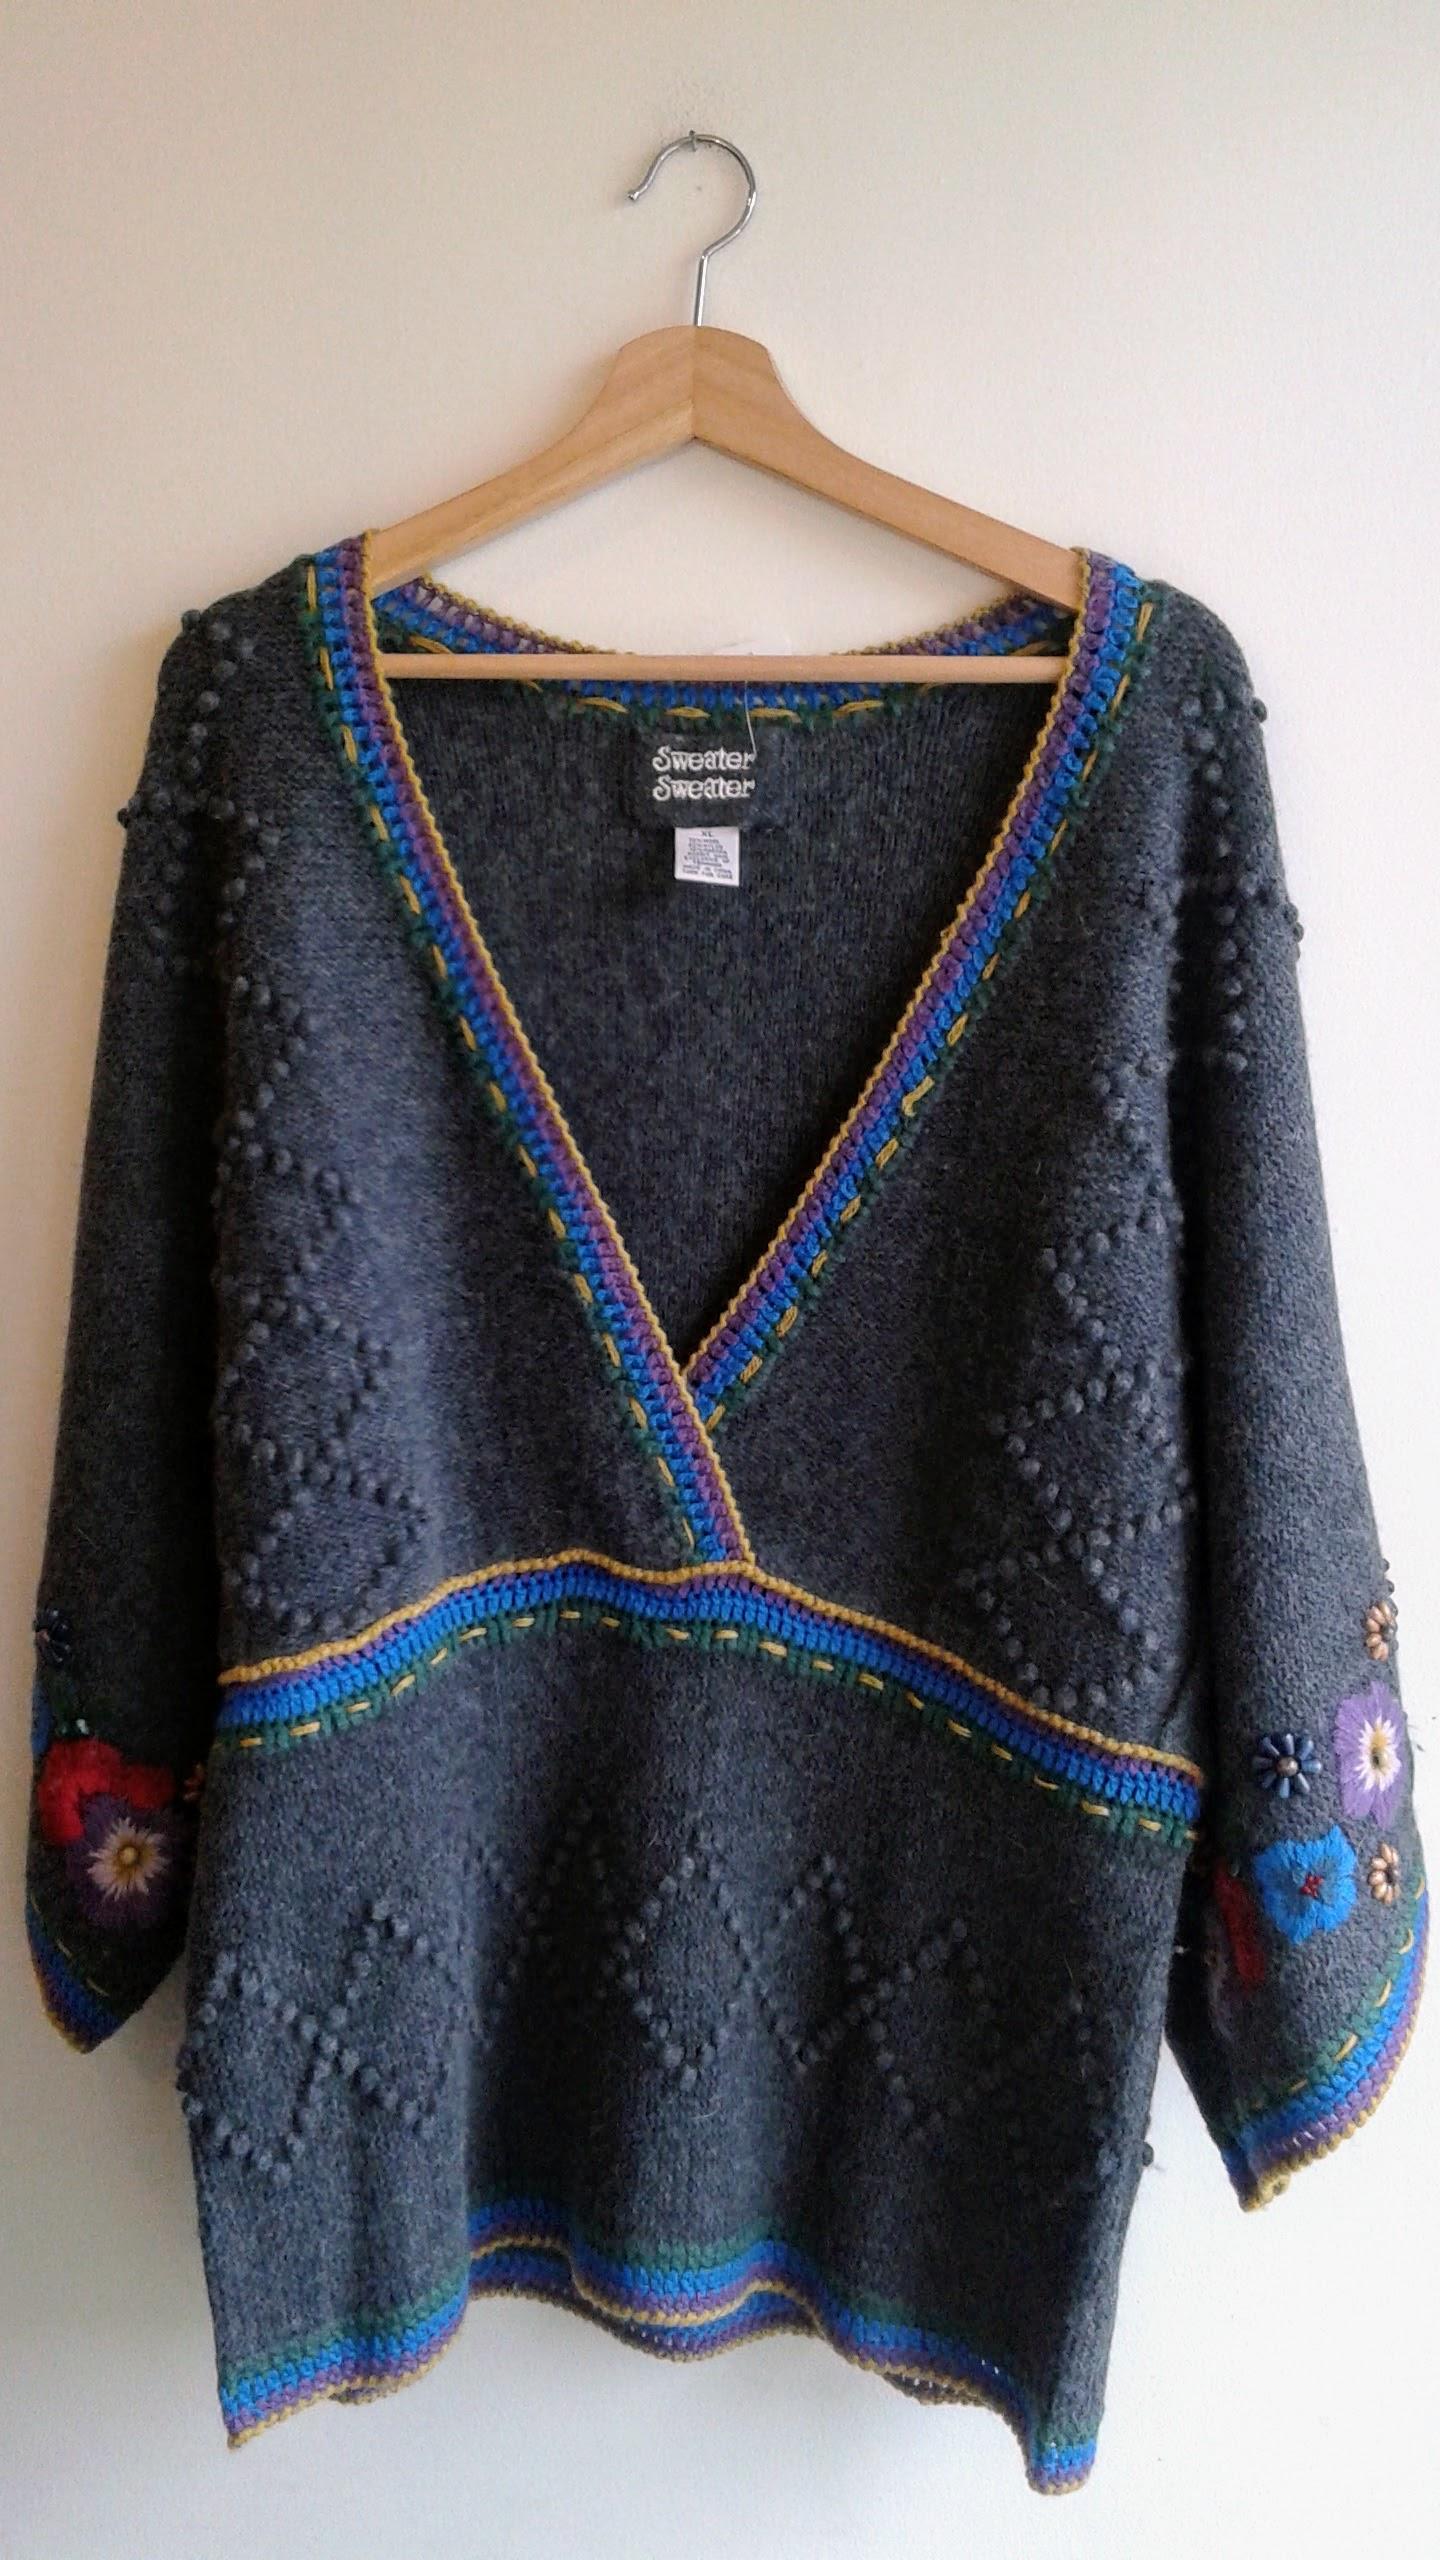 Sweater Sweater sweater; Size XL, $38